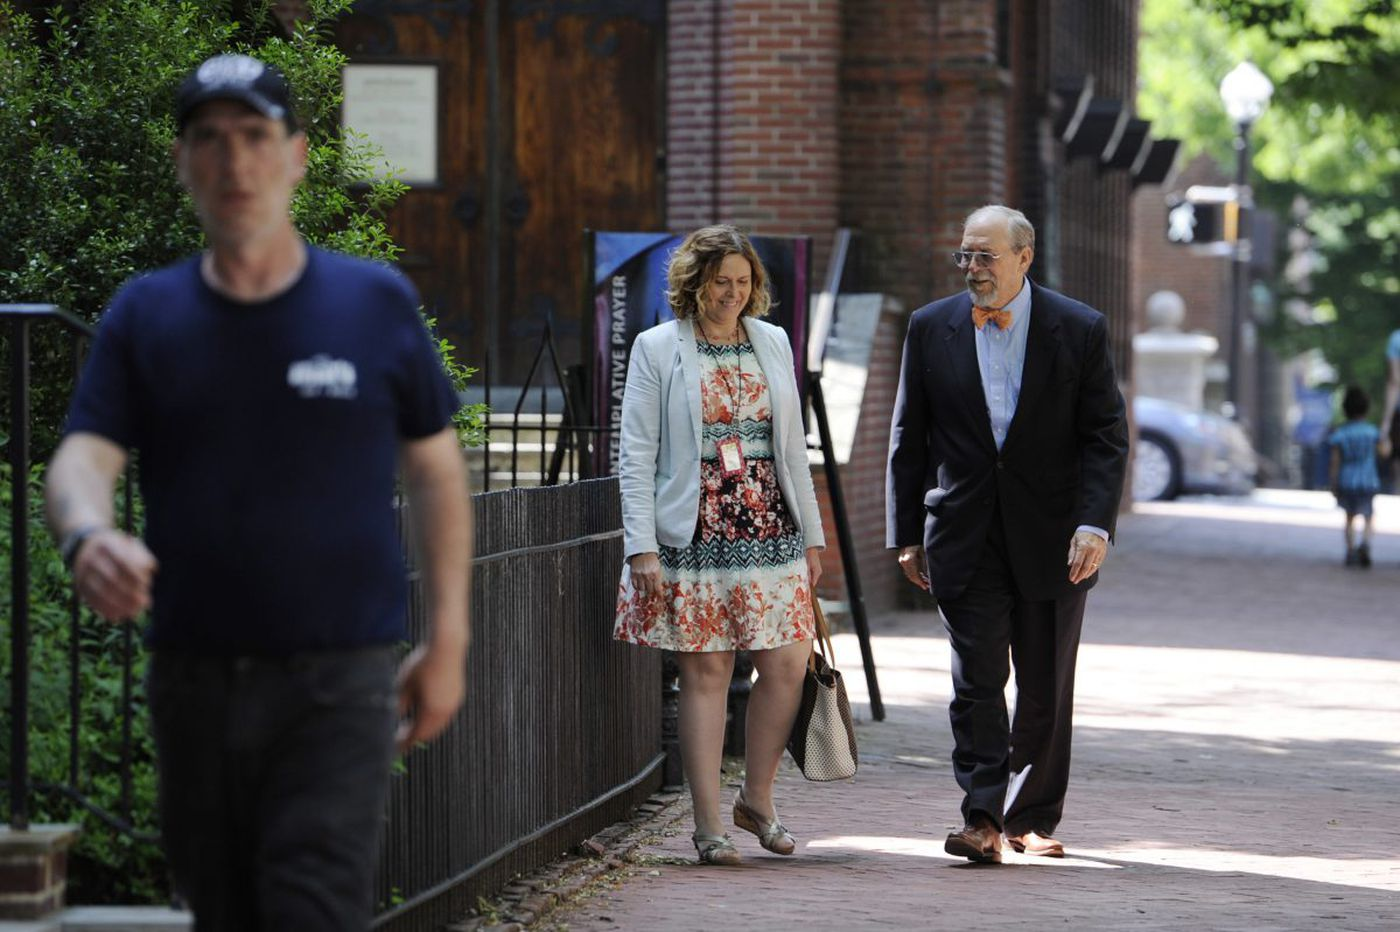 Political fight brews between Pa. towns, wireless firms over 5G antennas